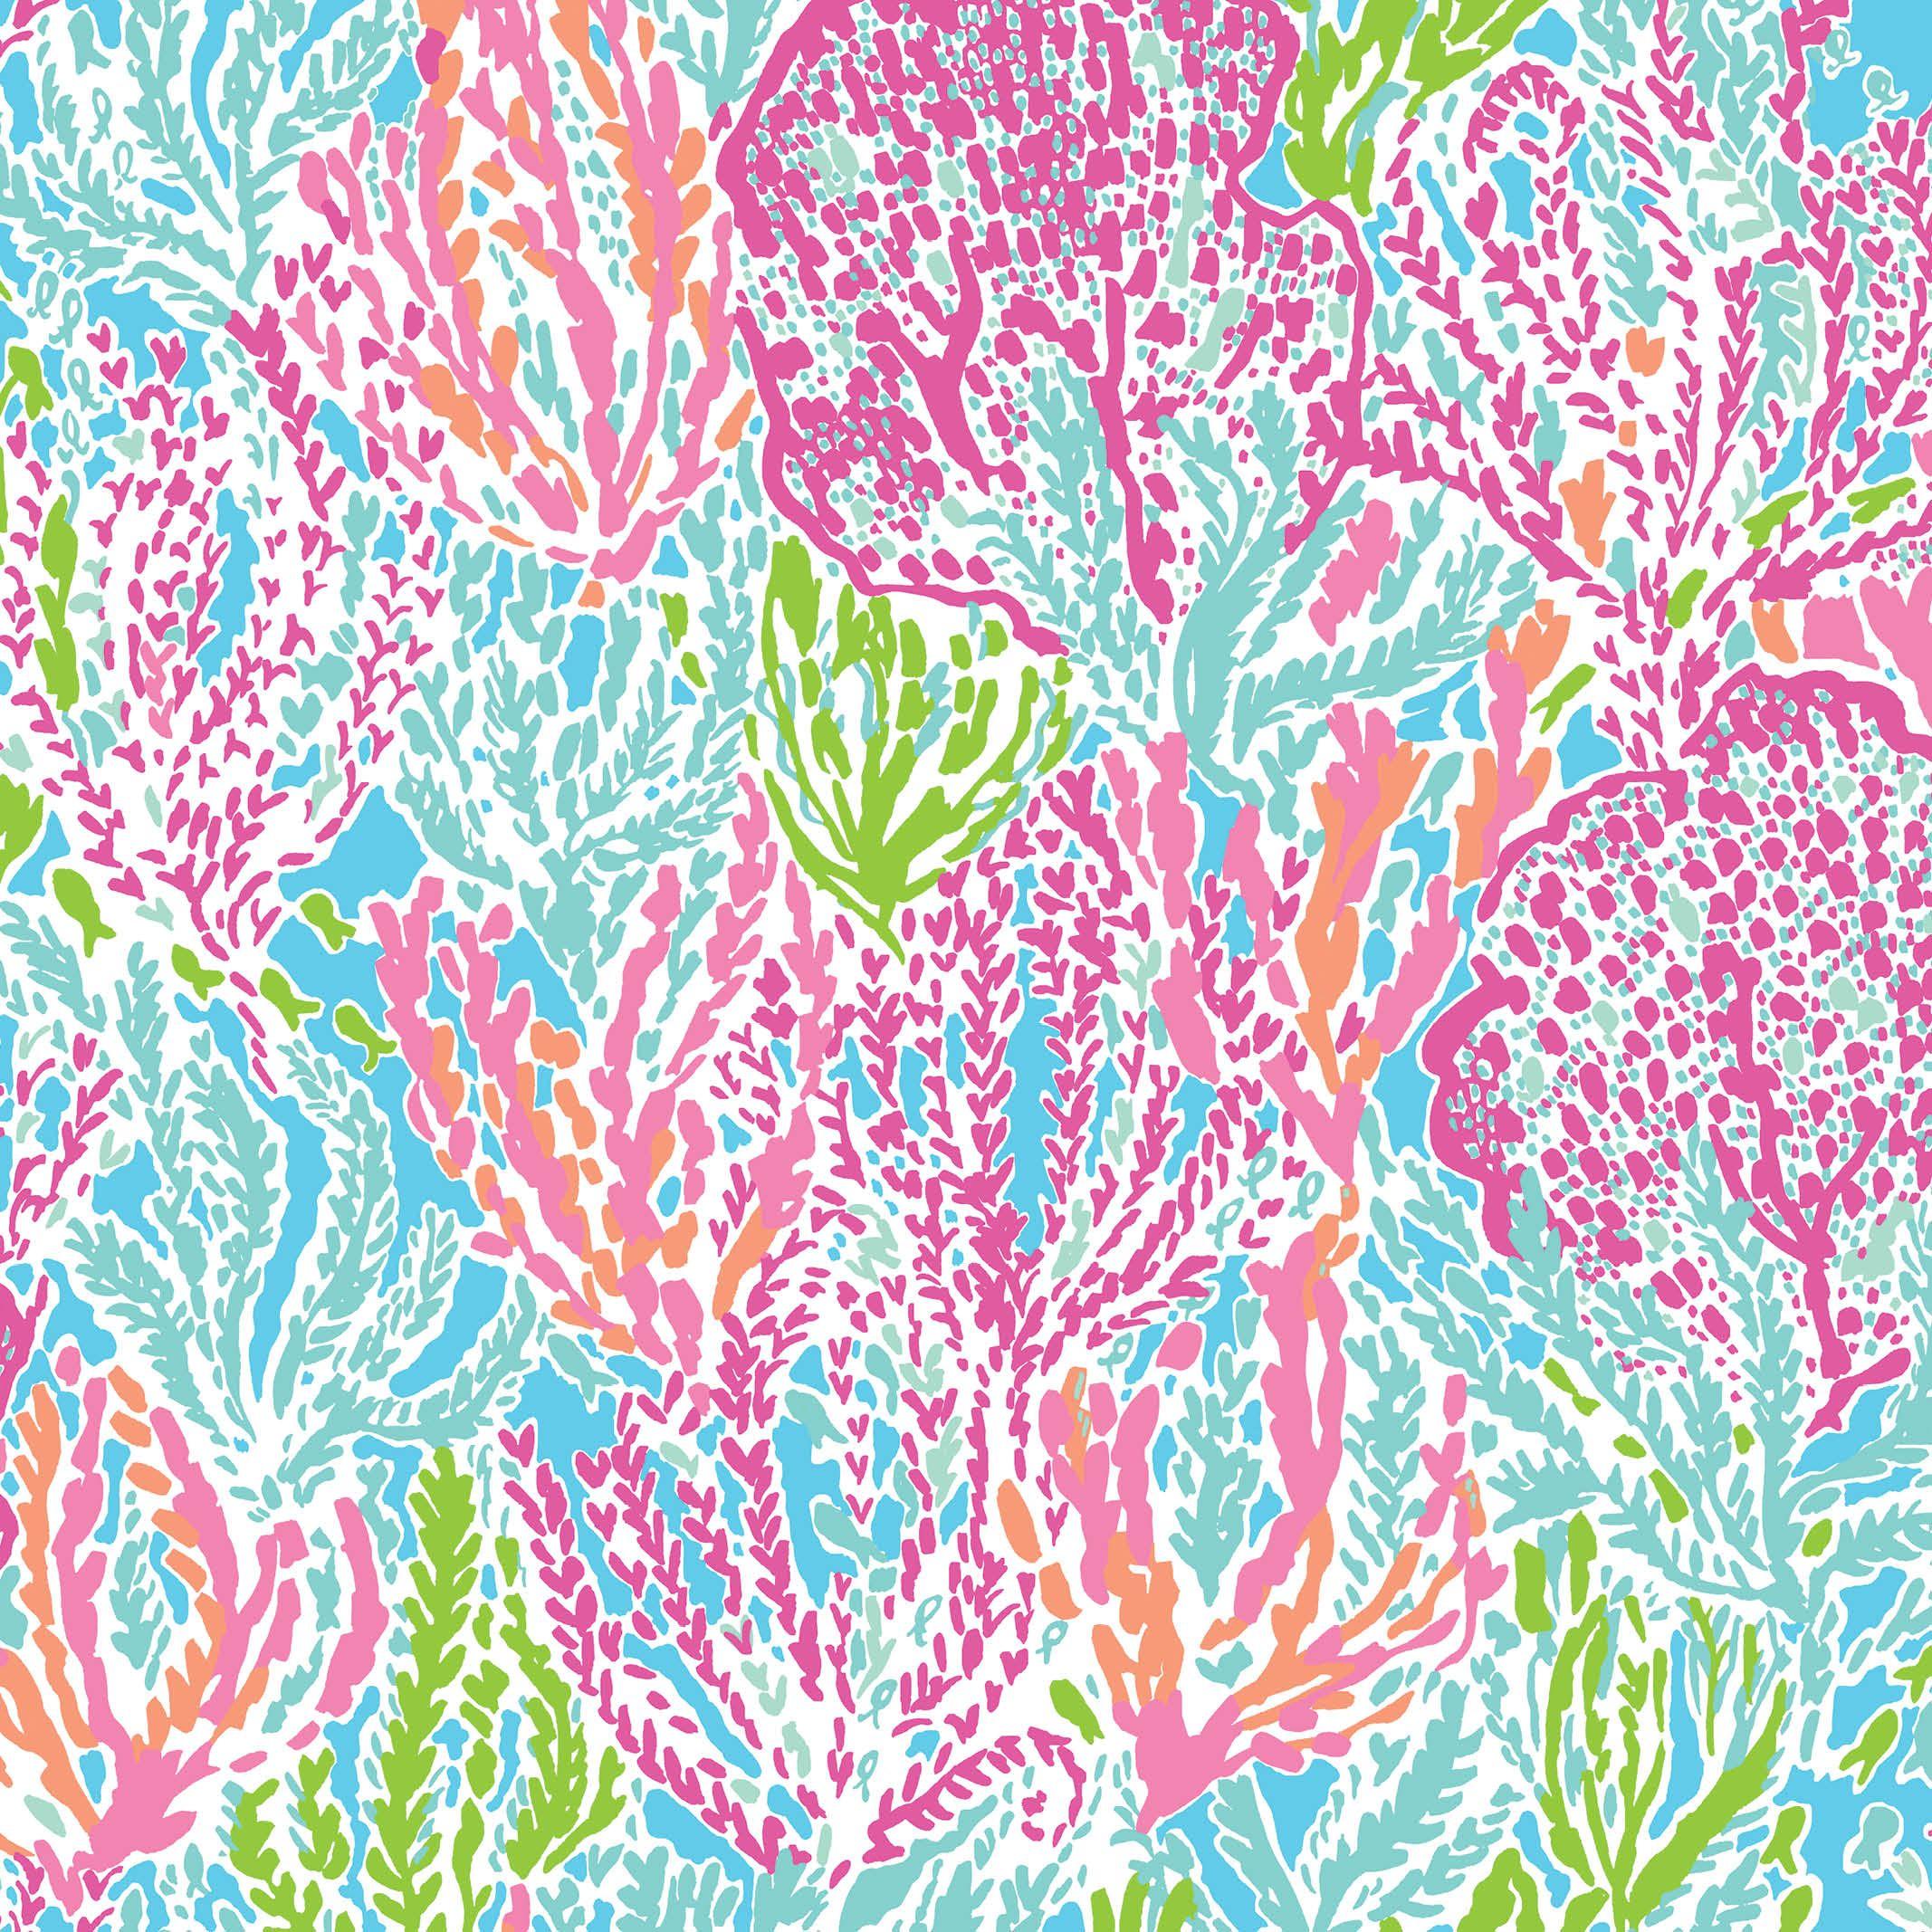 Lilly Pulitzer Carrots Prints Pinterest